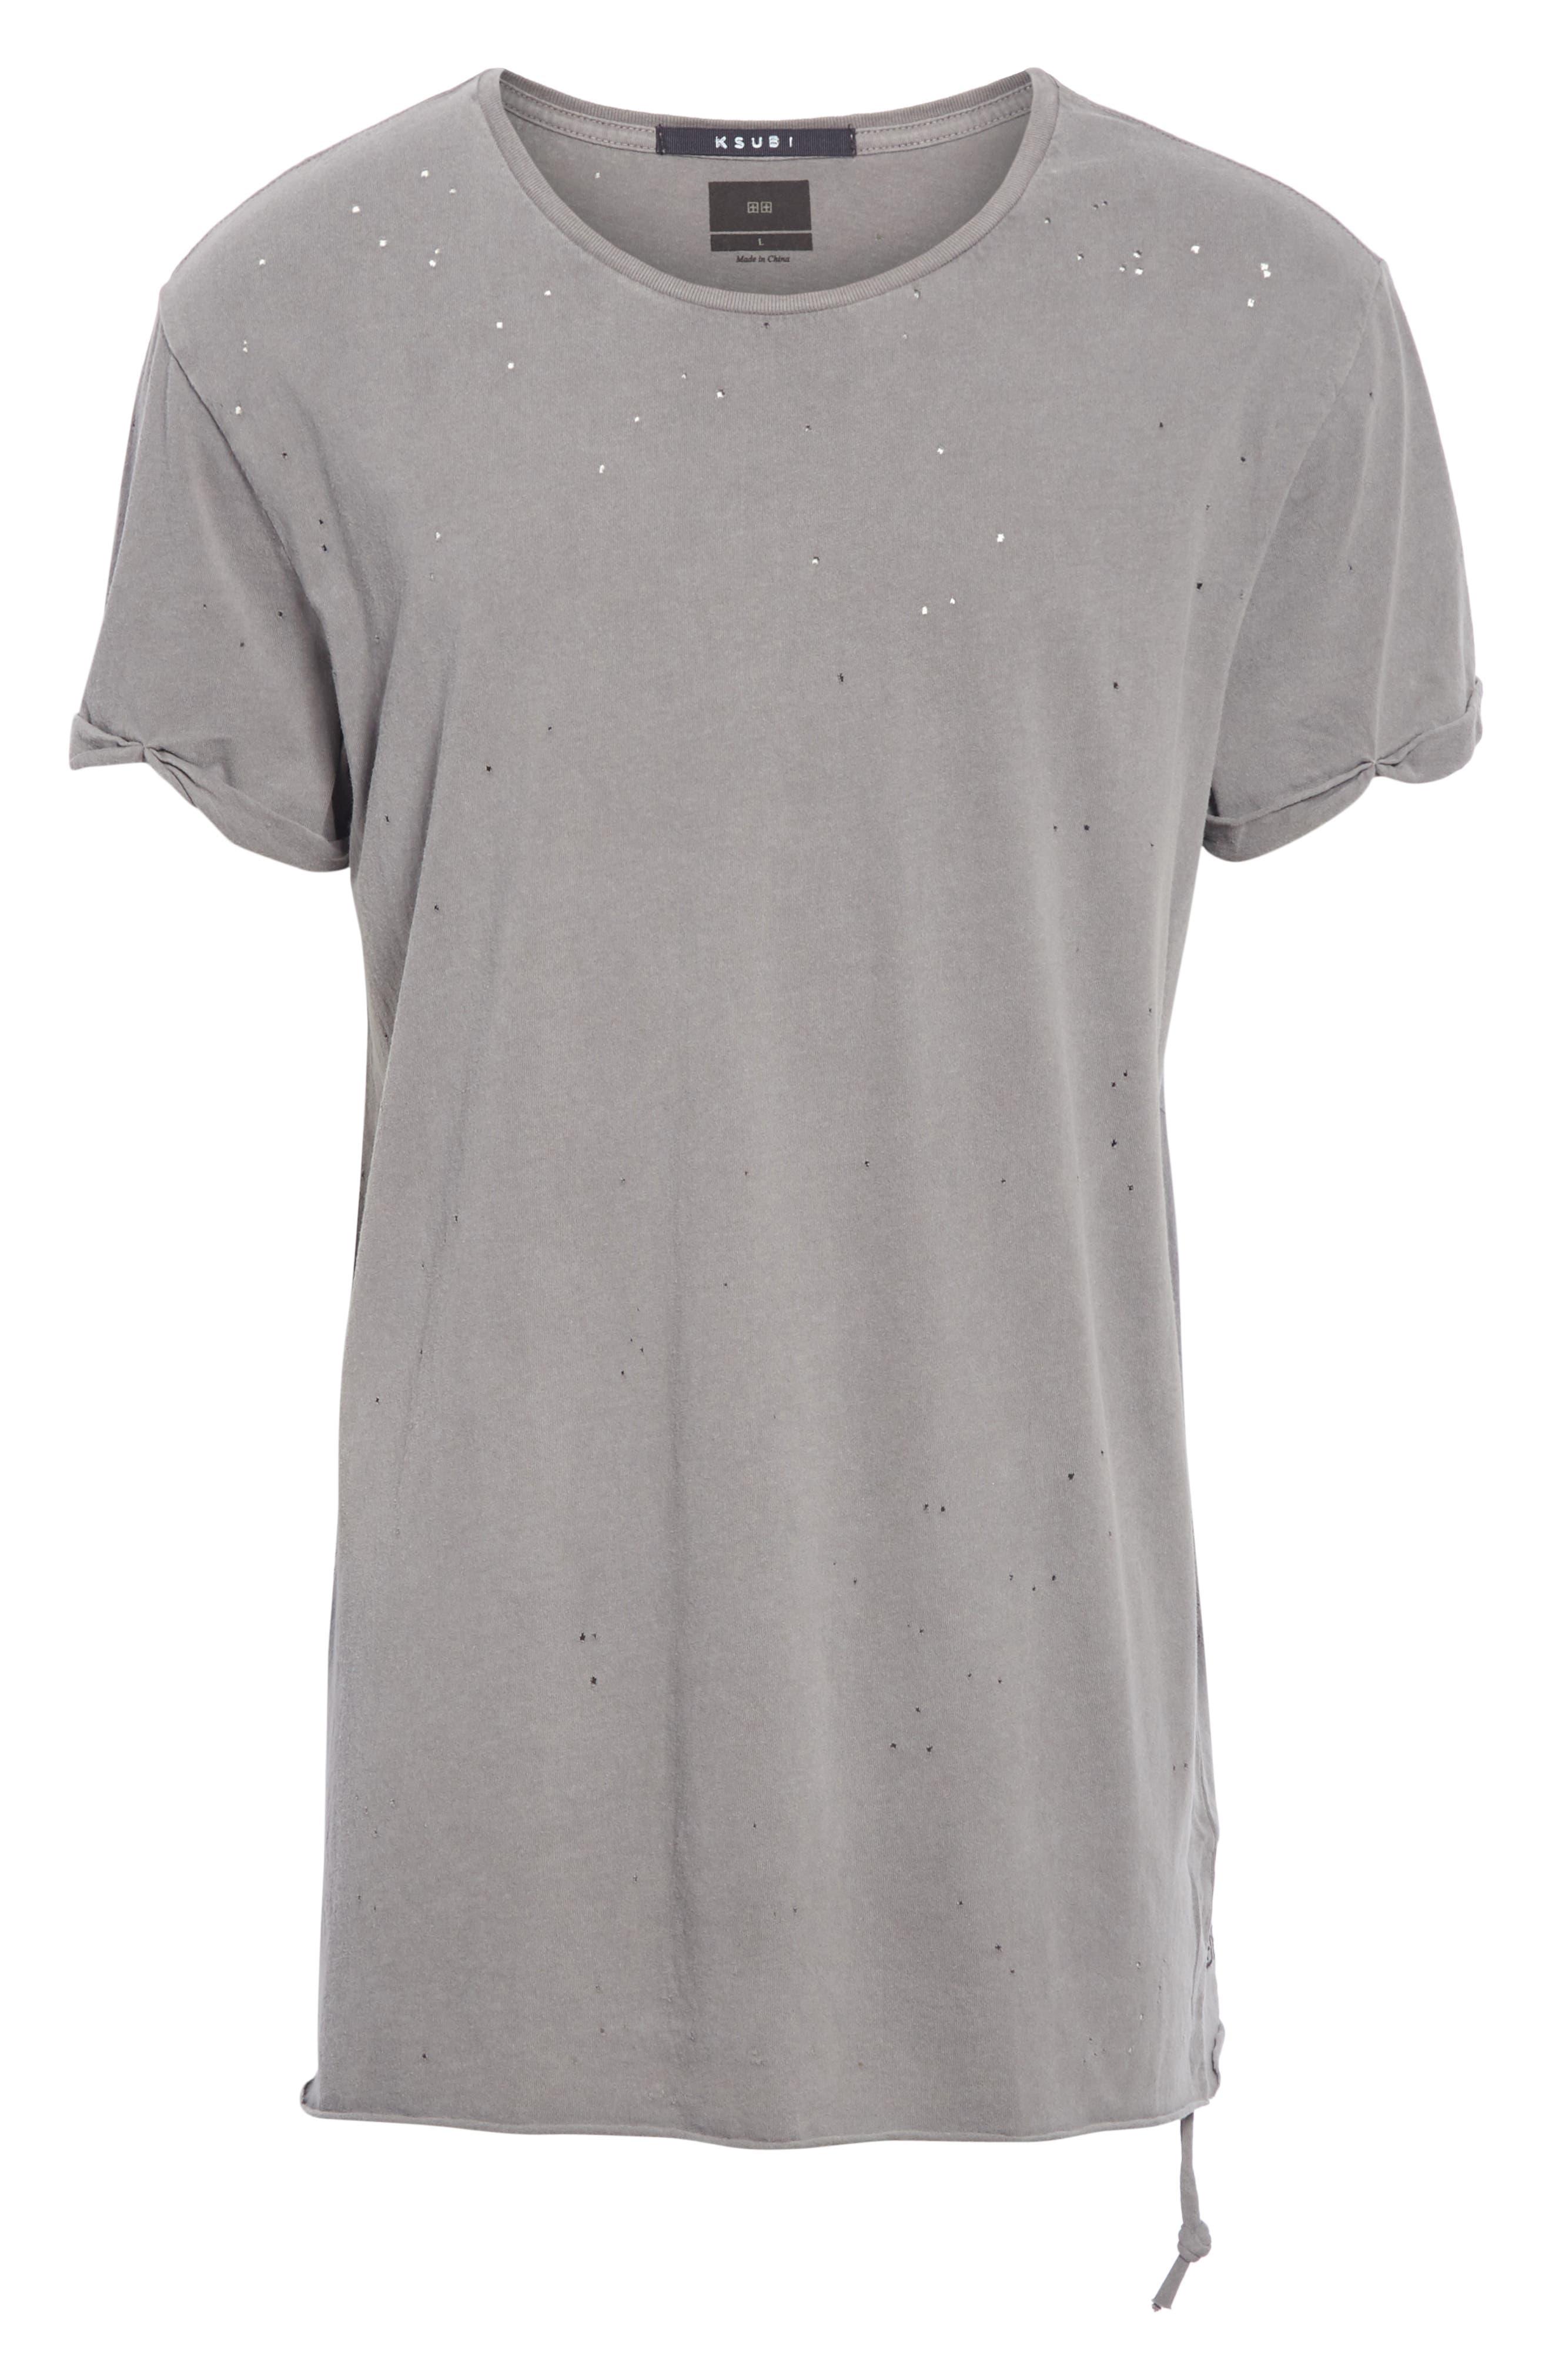 Kodeine Distressed T-Shirt,                             Alternate thumbnail 6, color,                             GREY